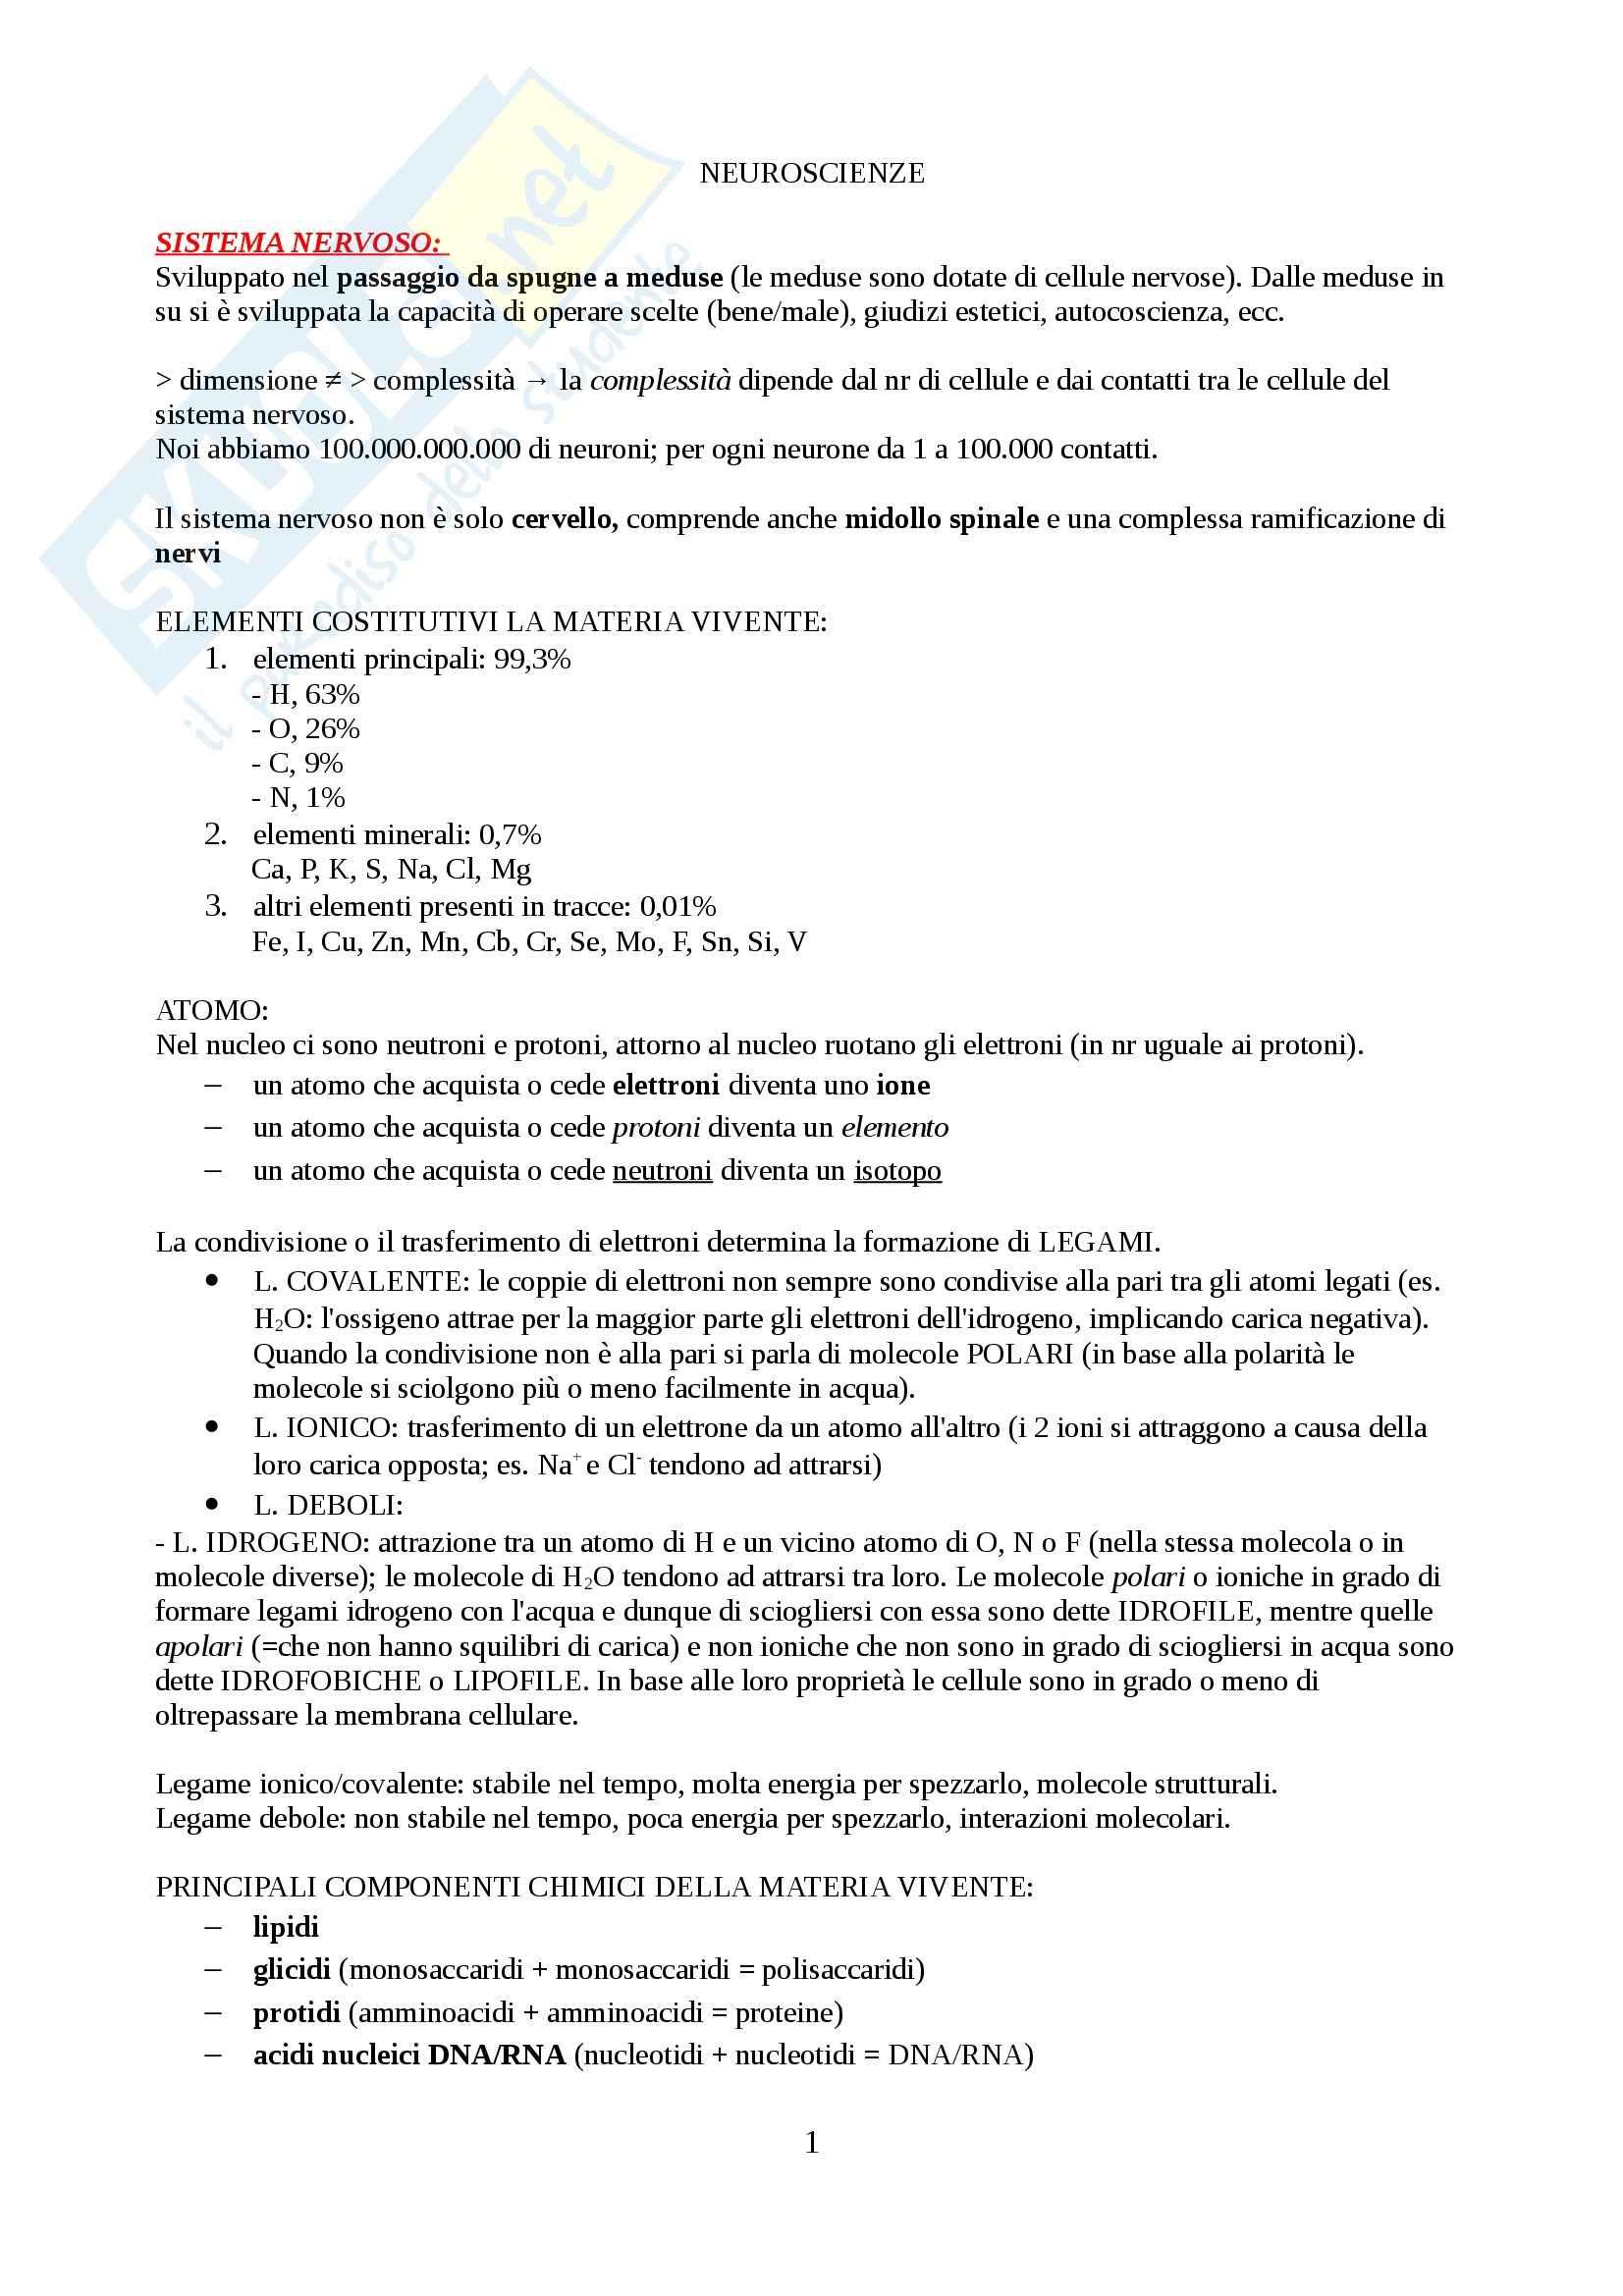 Neuroscienze - Appunti